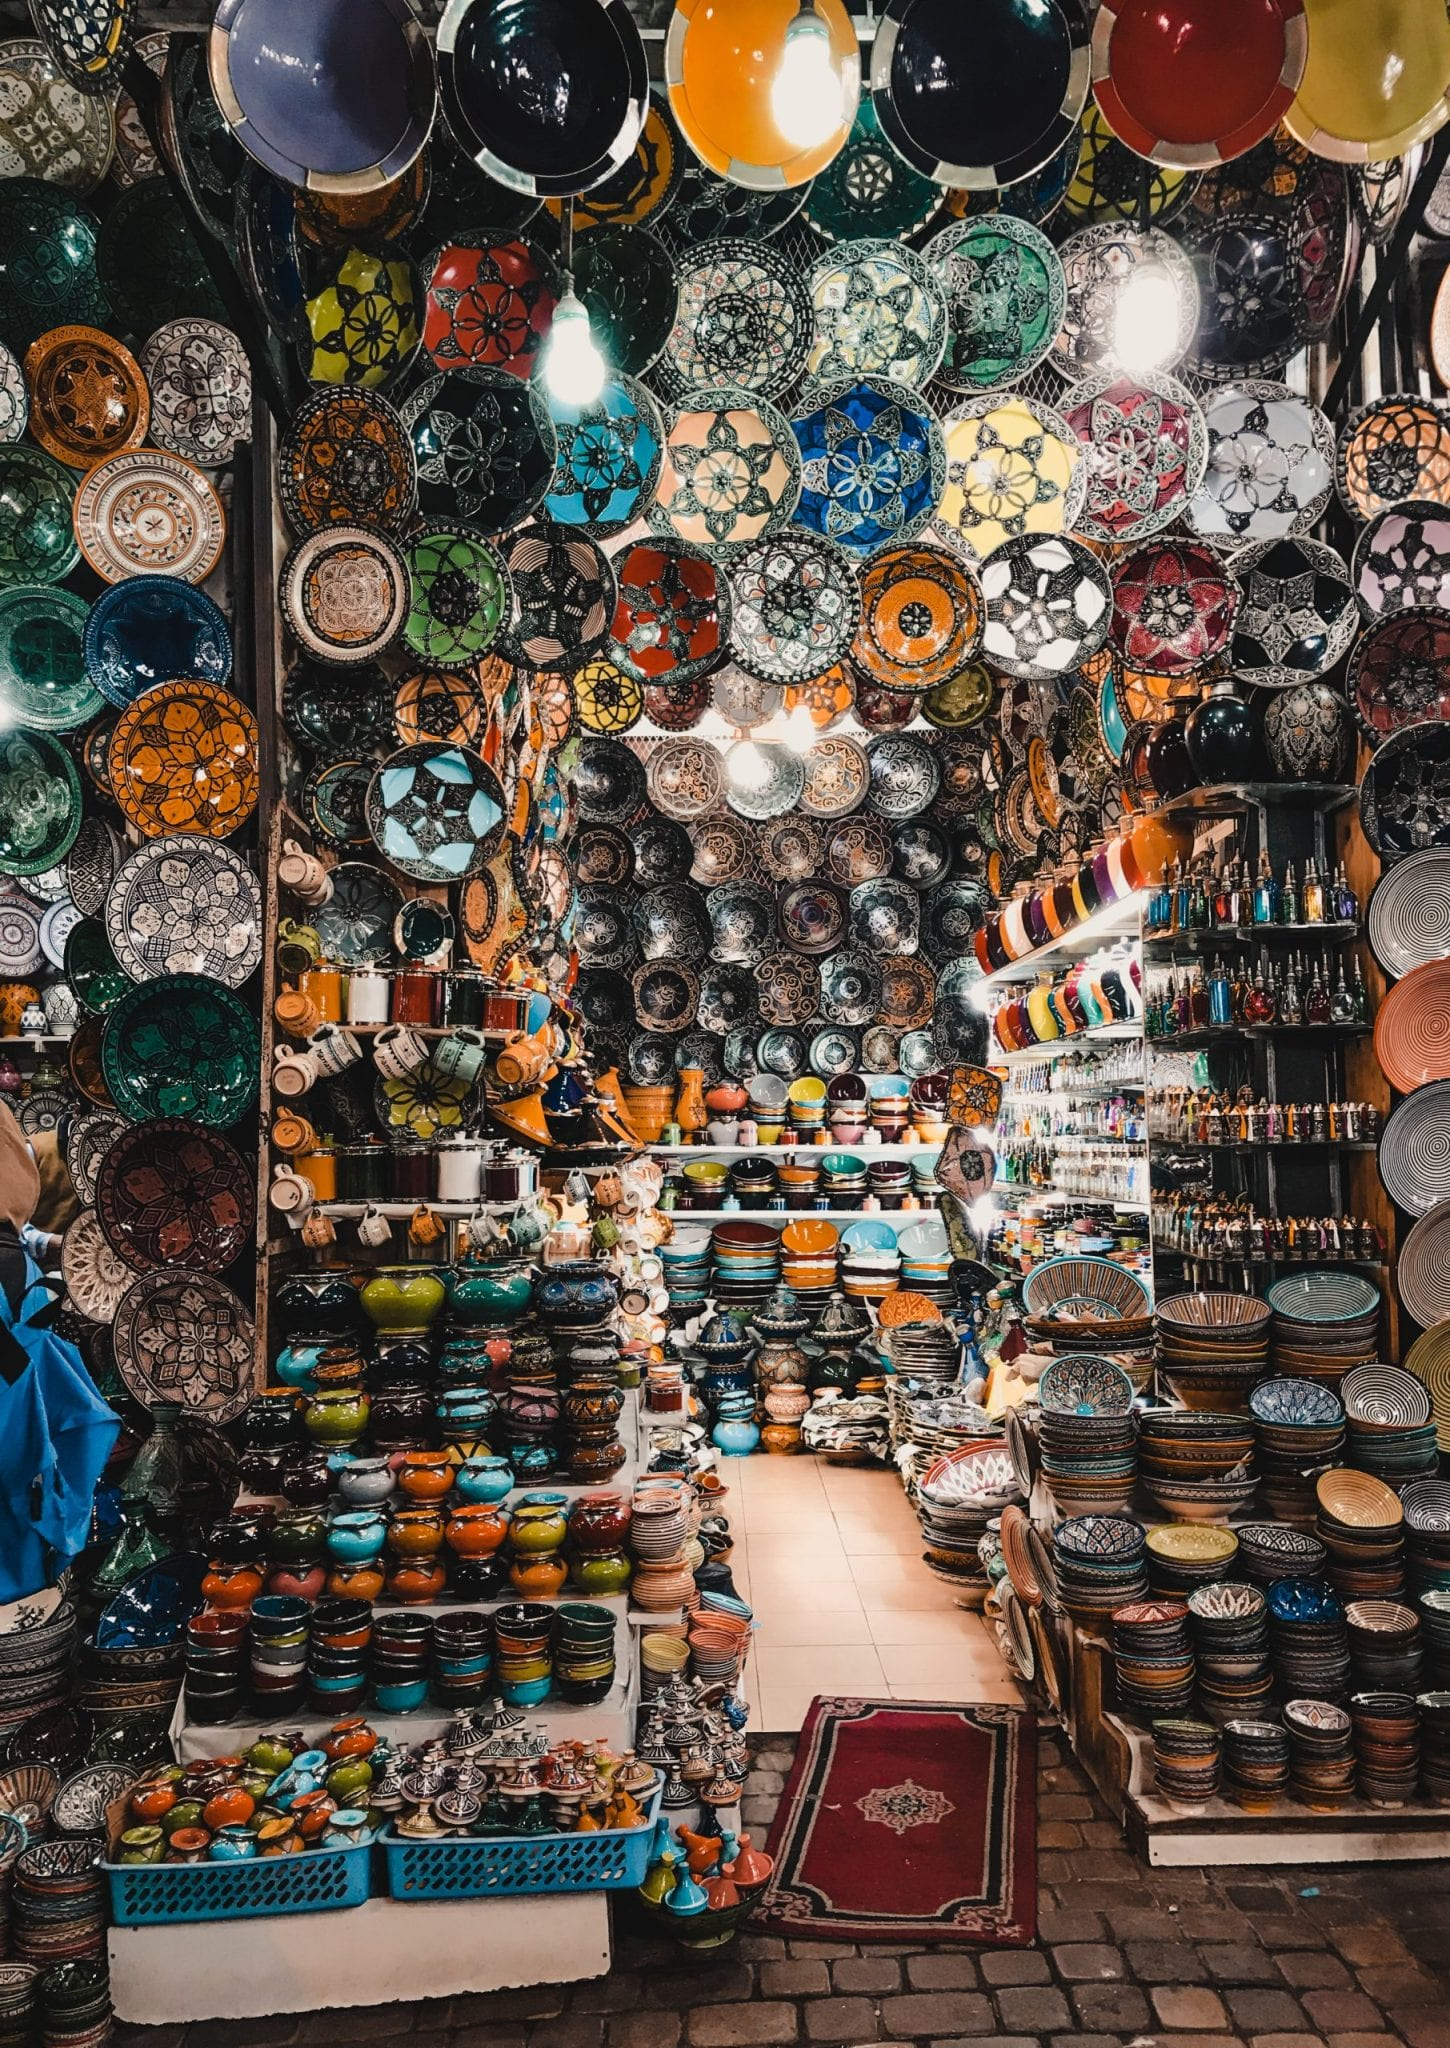 Ceramic shop in Fez, Morocco shopping